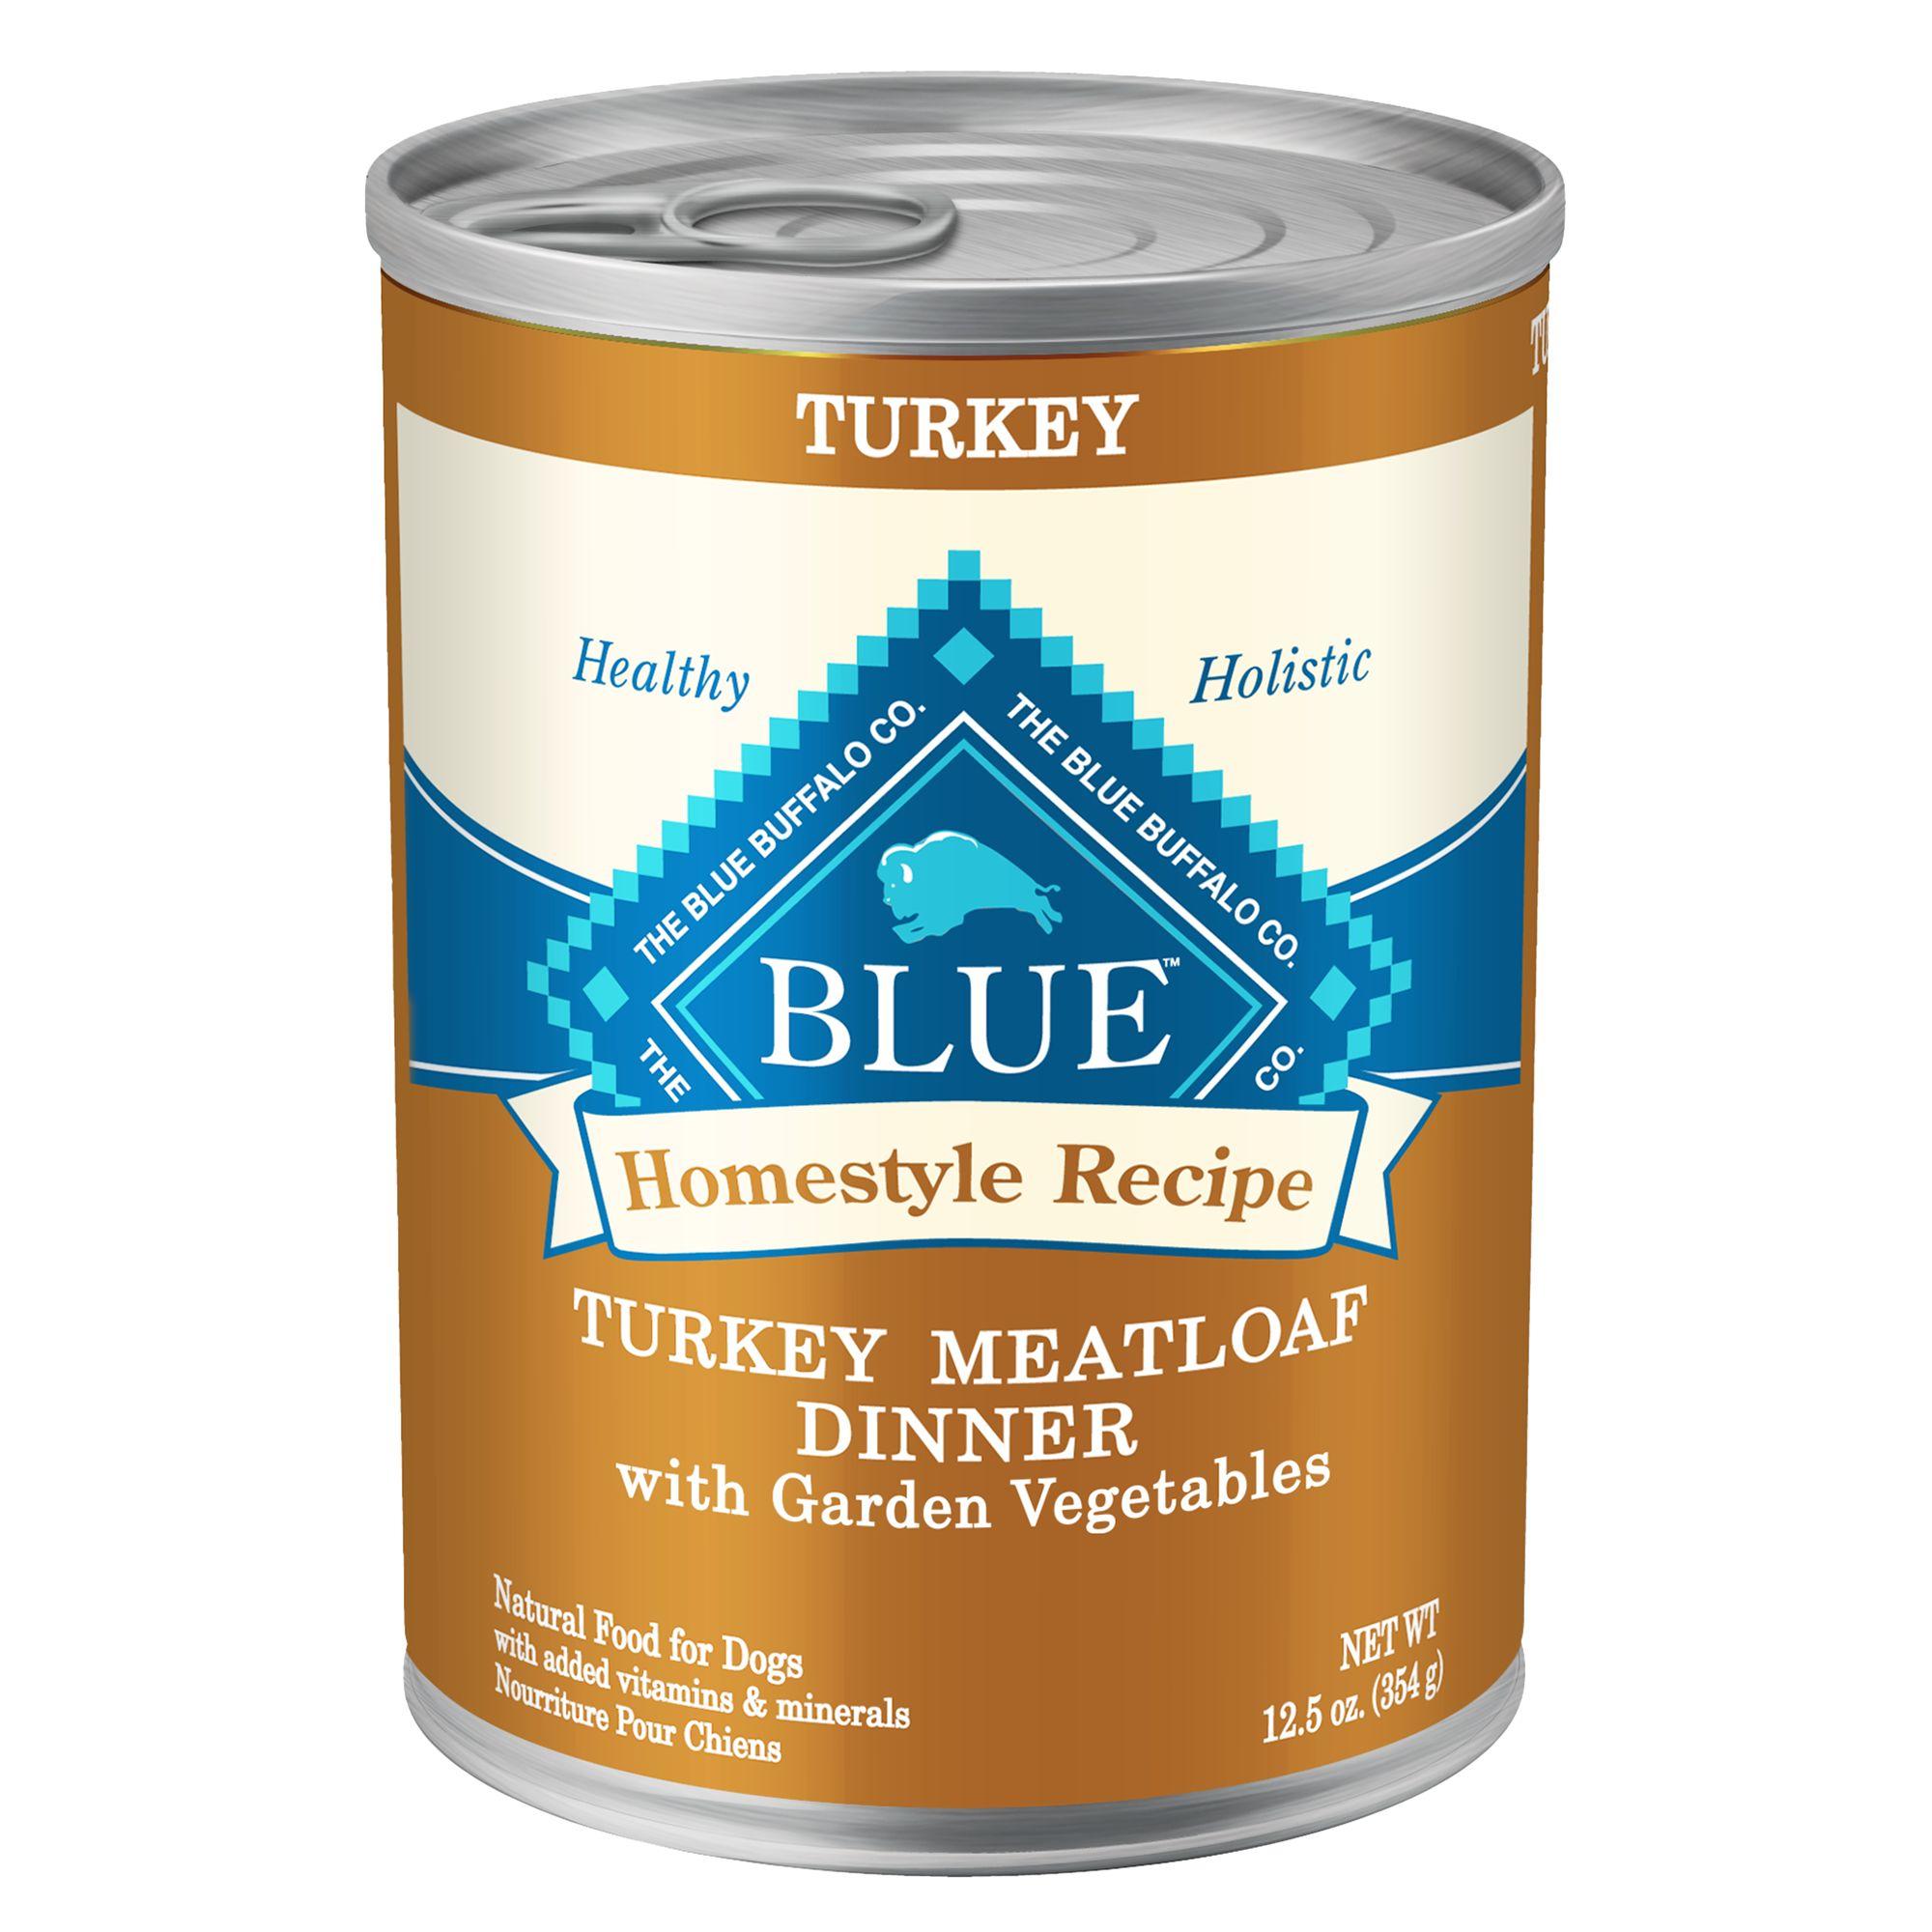 Blue Homestyle Recipe Adult Dog Food size: 12.5 Oz, Blue Buffalo, Turkey Meatloaf with Carrots & Sweet Potatoes